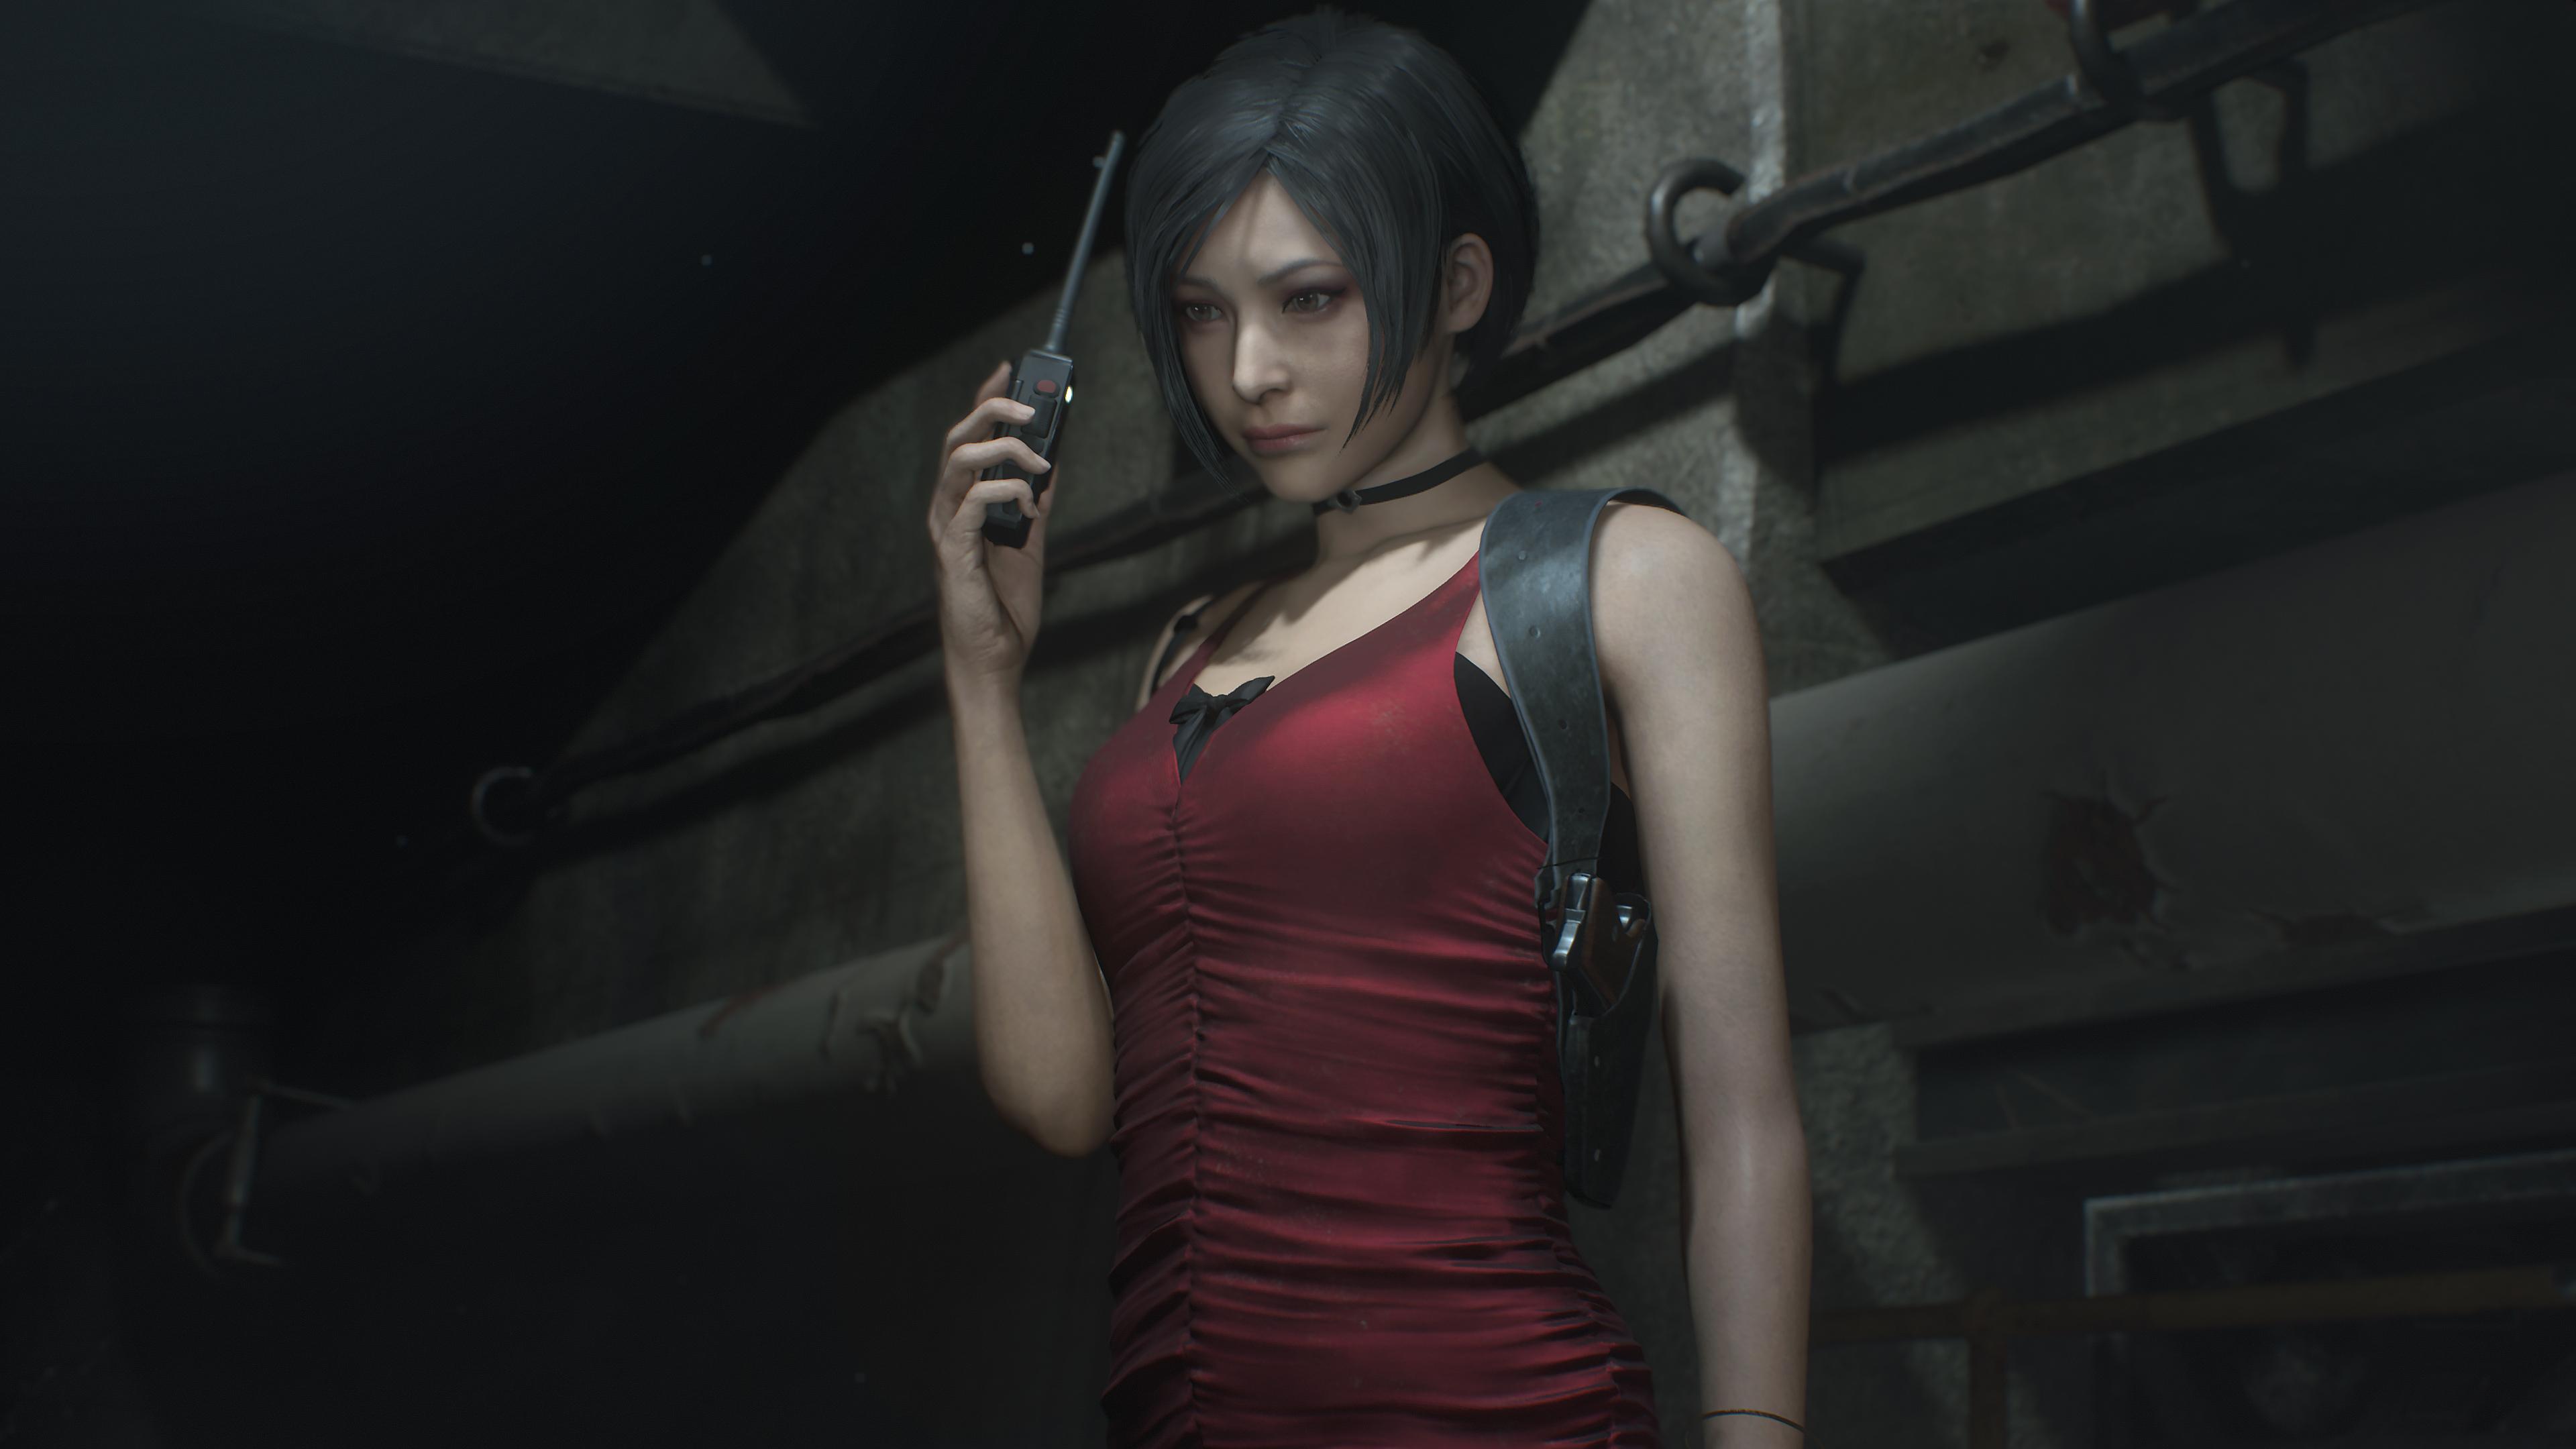 Resident Evil 2 Wallpaper: Claire Redfield Resident Evil 2 2019, HD Games, 4k